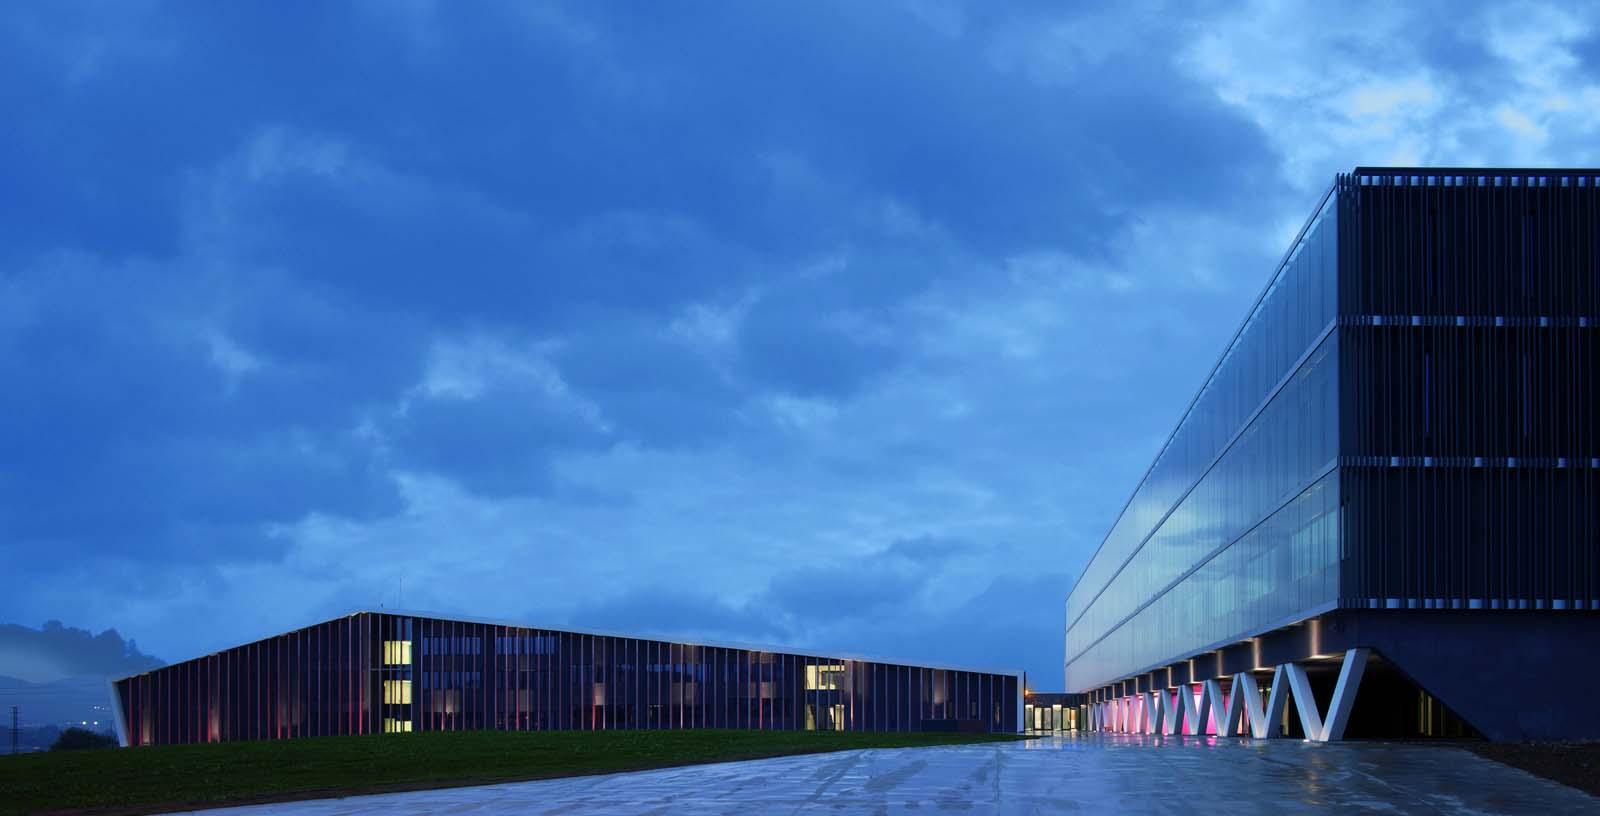 Teacher_Training_School_01_Architecture_Idom_photos_Aitor_Ortiz